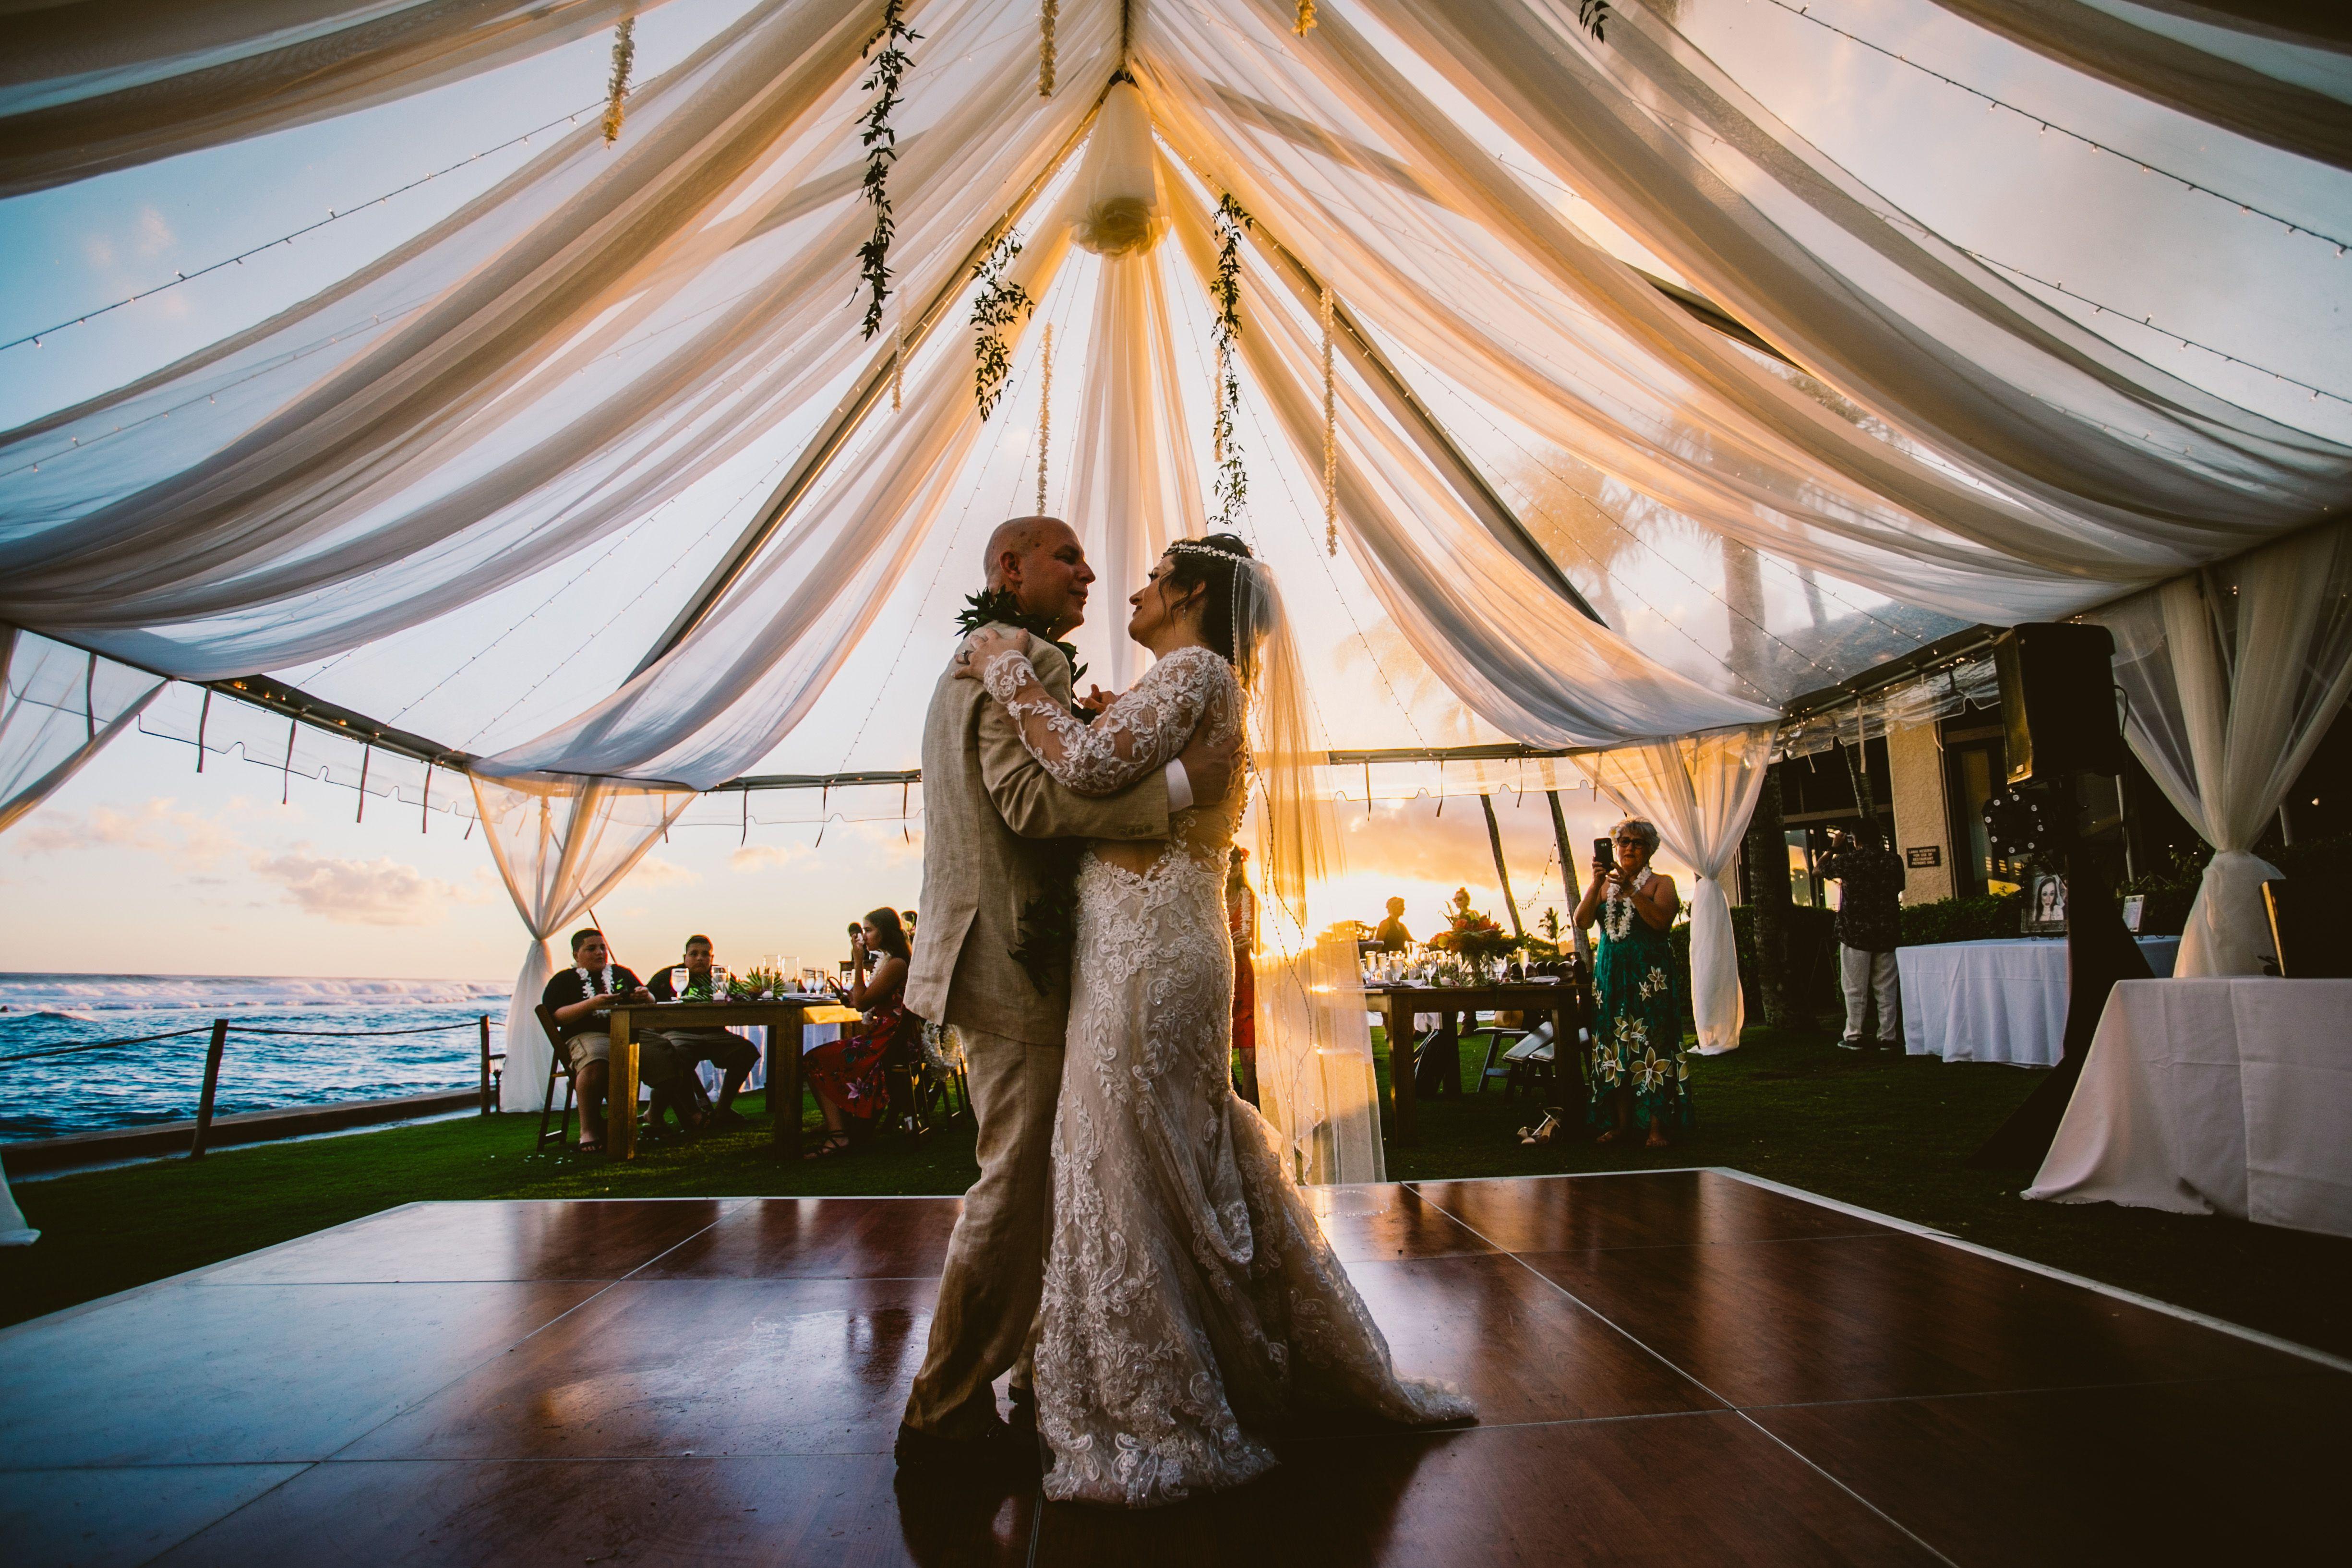 Destination Hawaii Wedding Lawn Reception 30 Guests